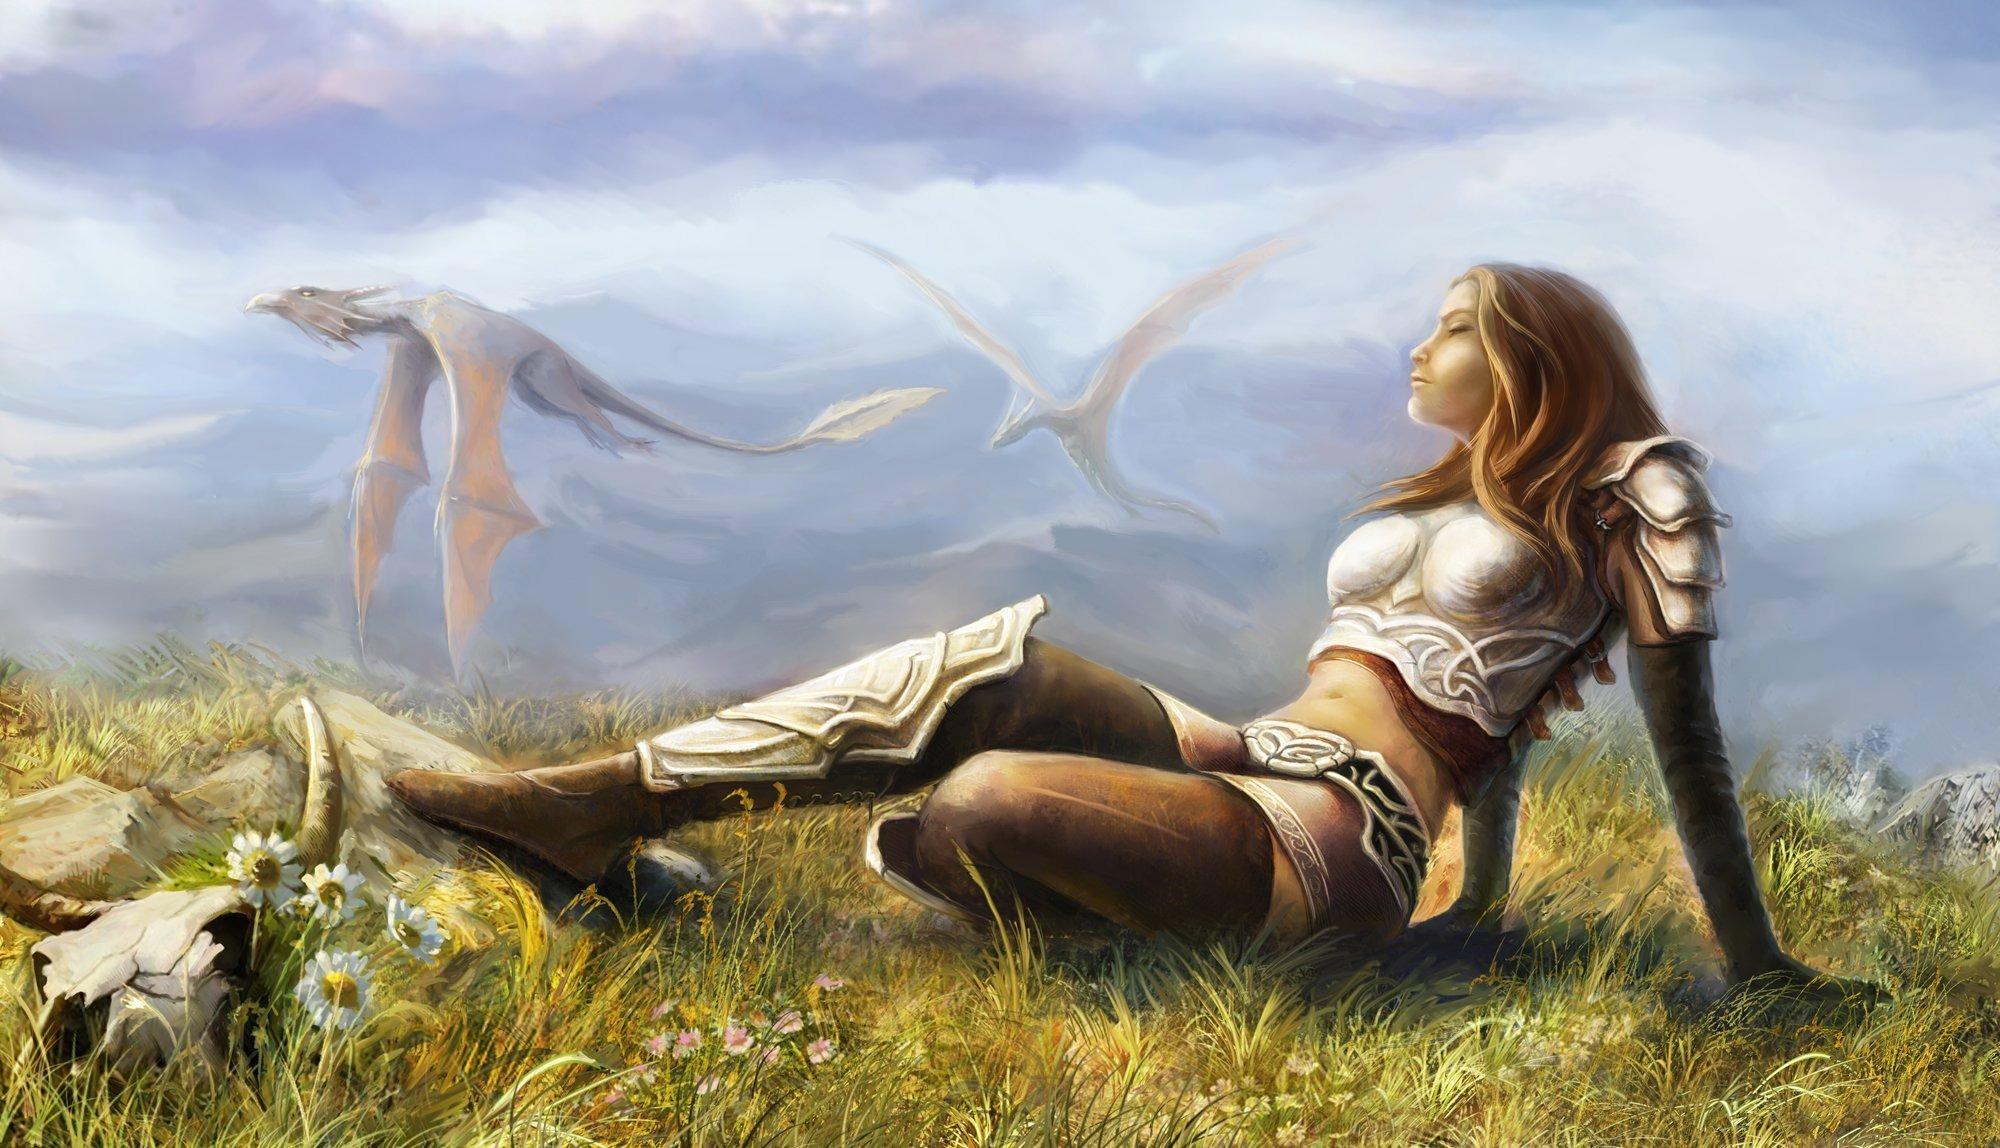 Medieval fantasy babe's nude archer sex photo